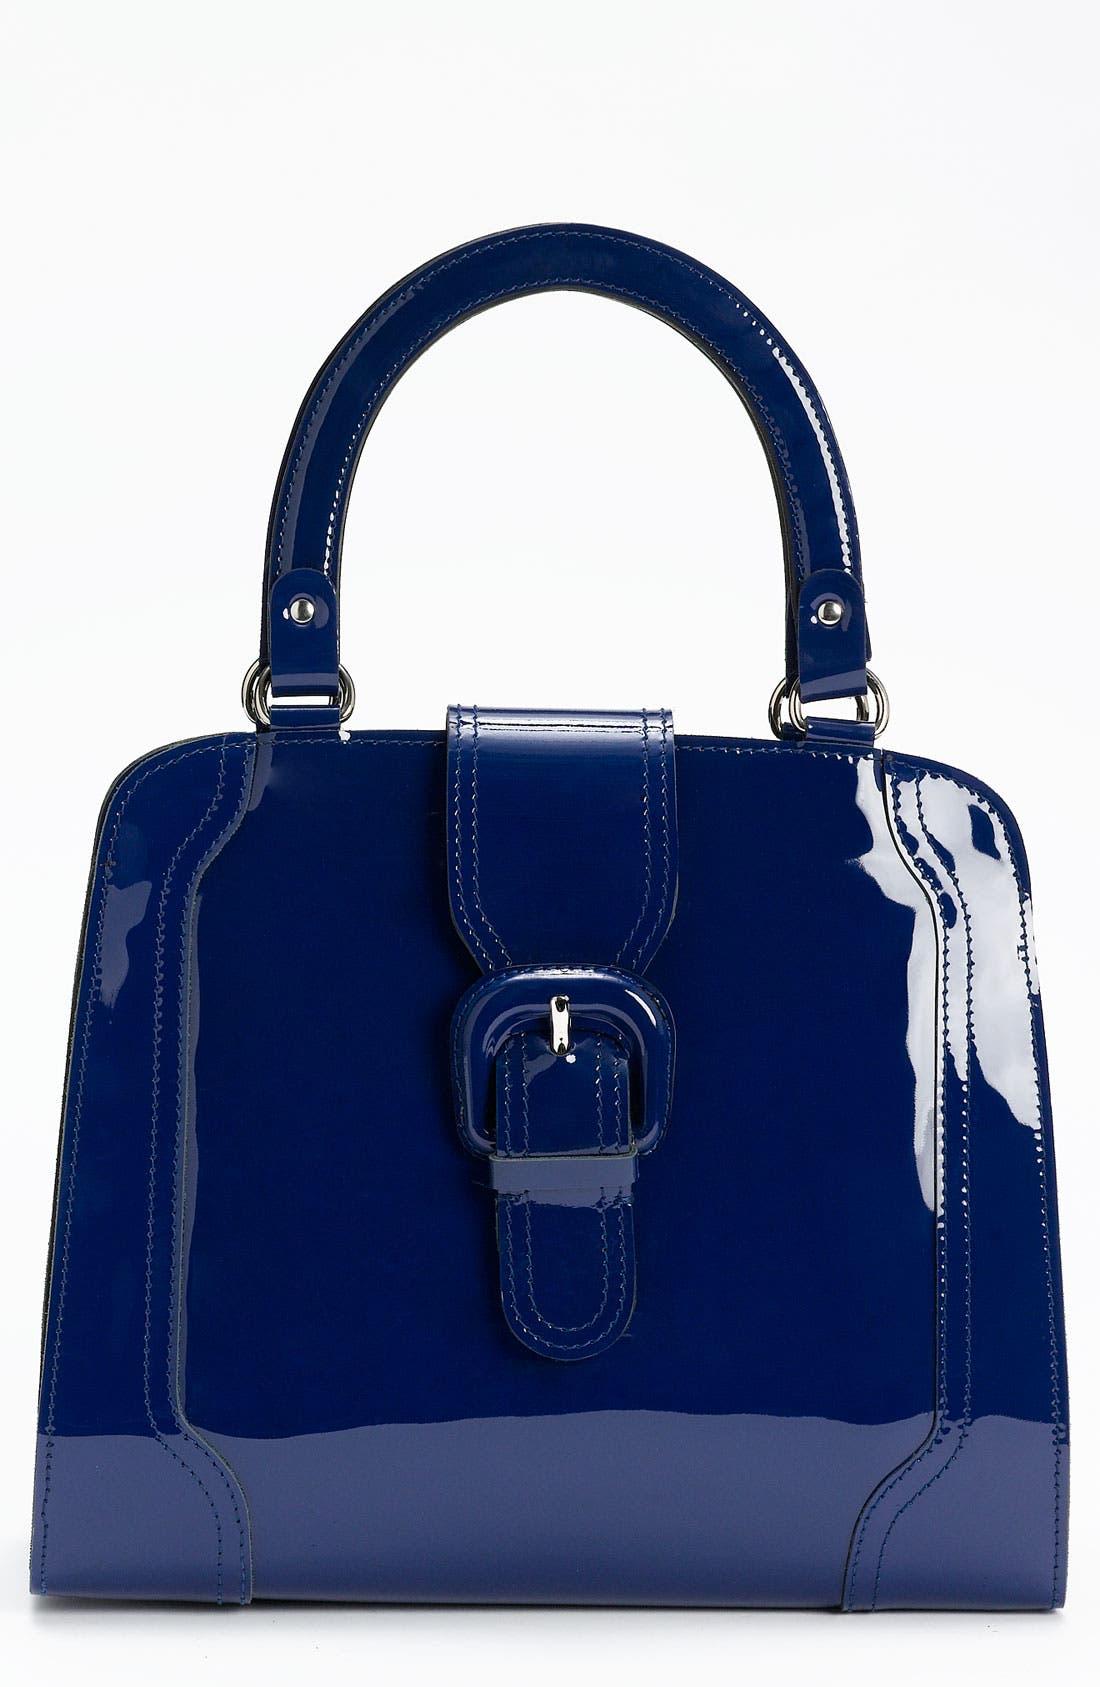 Alternate Image 1 Selected - Marni 'Medium' Patent Leather Frame Bag